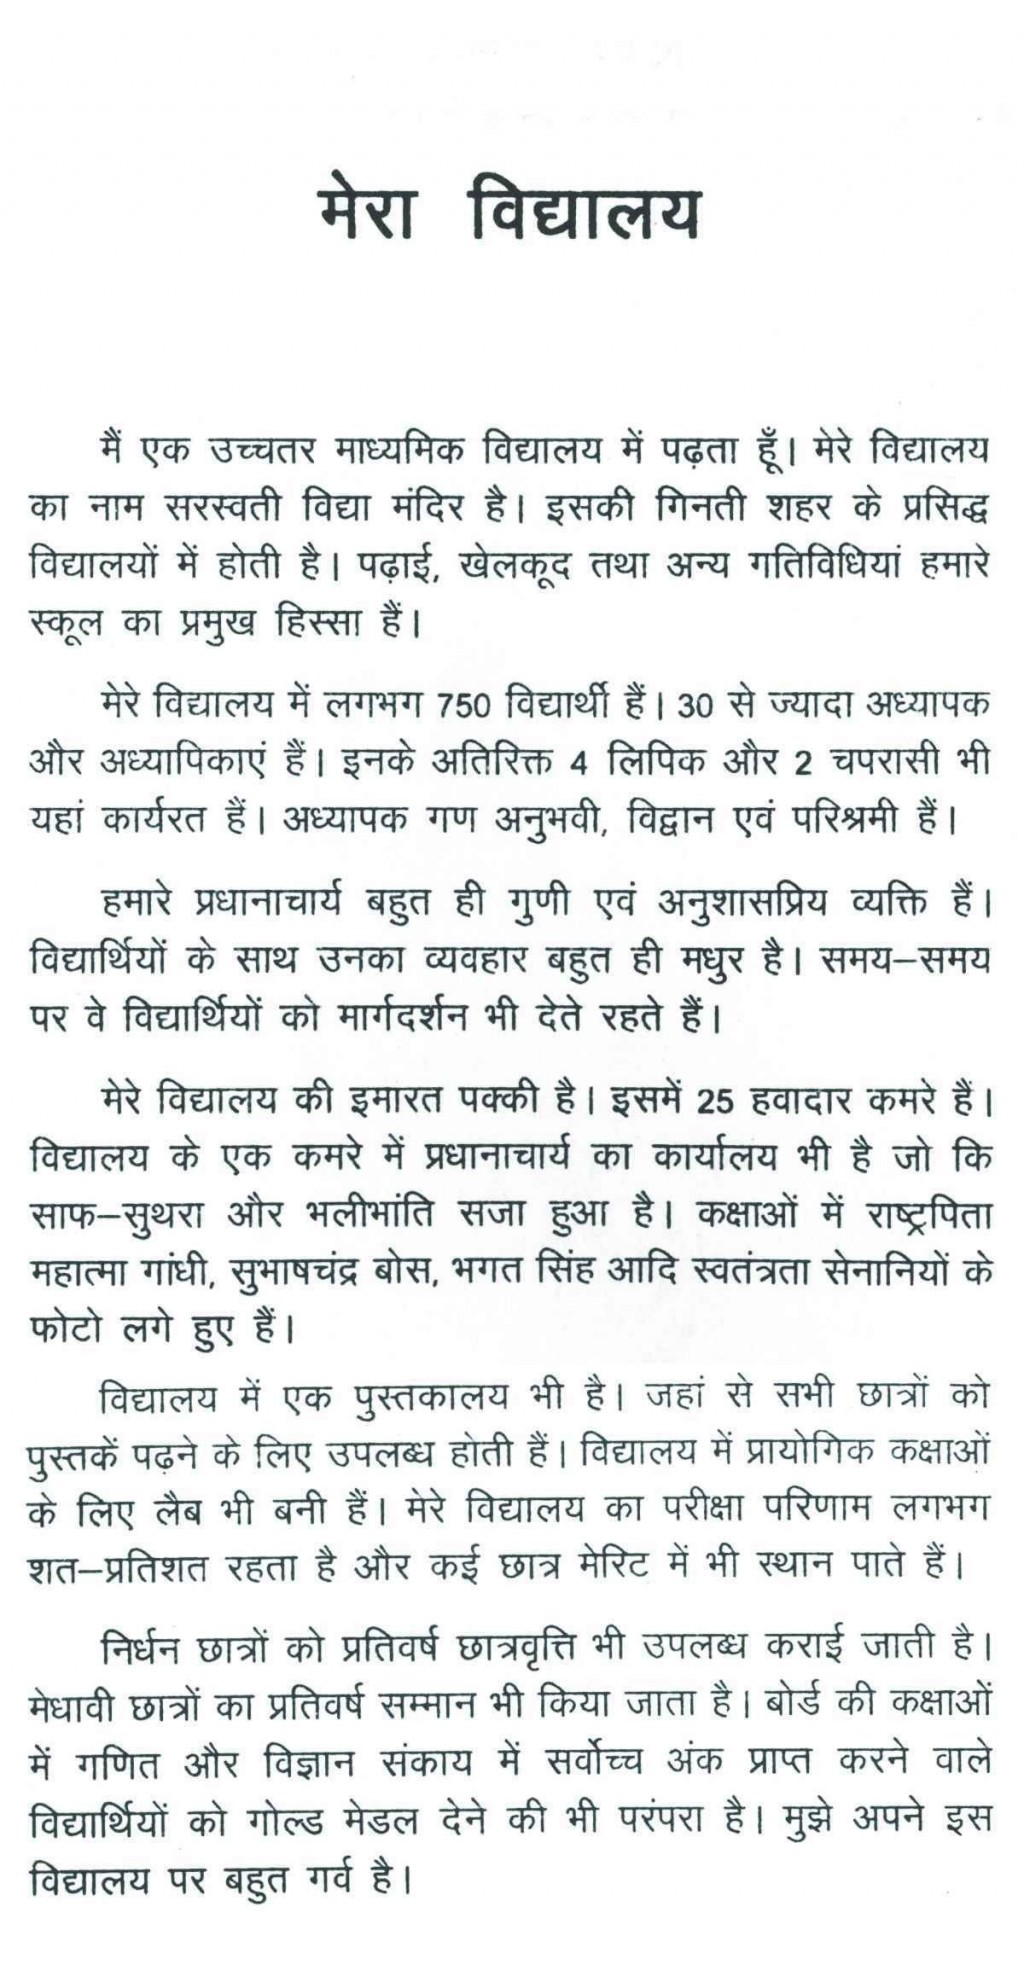 005 My School Essay O4mldyykxk Amazing Dream For Class 10 In Urdu 1 3 Marathi Large